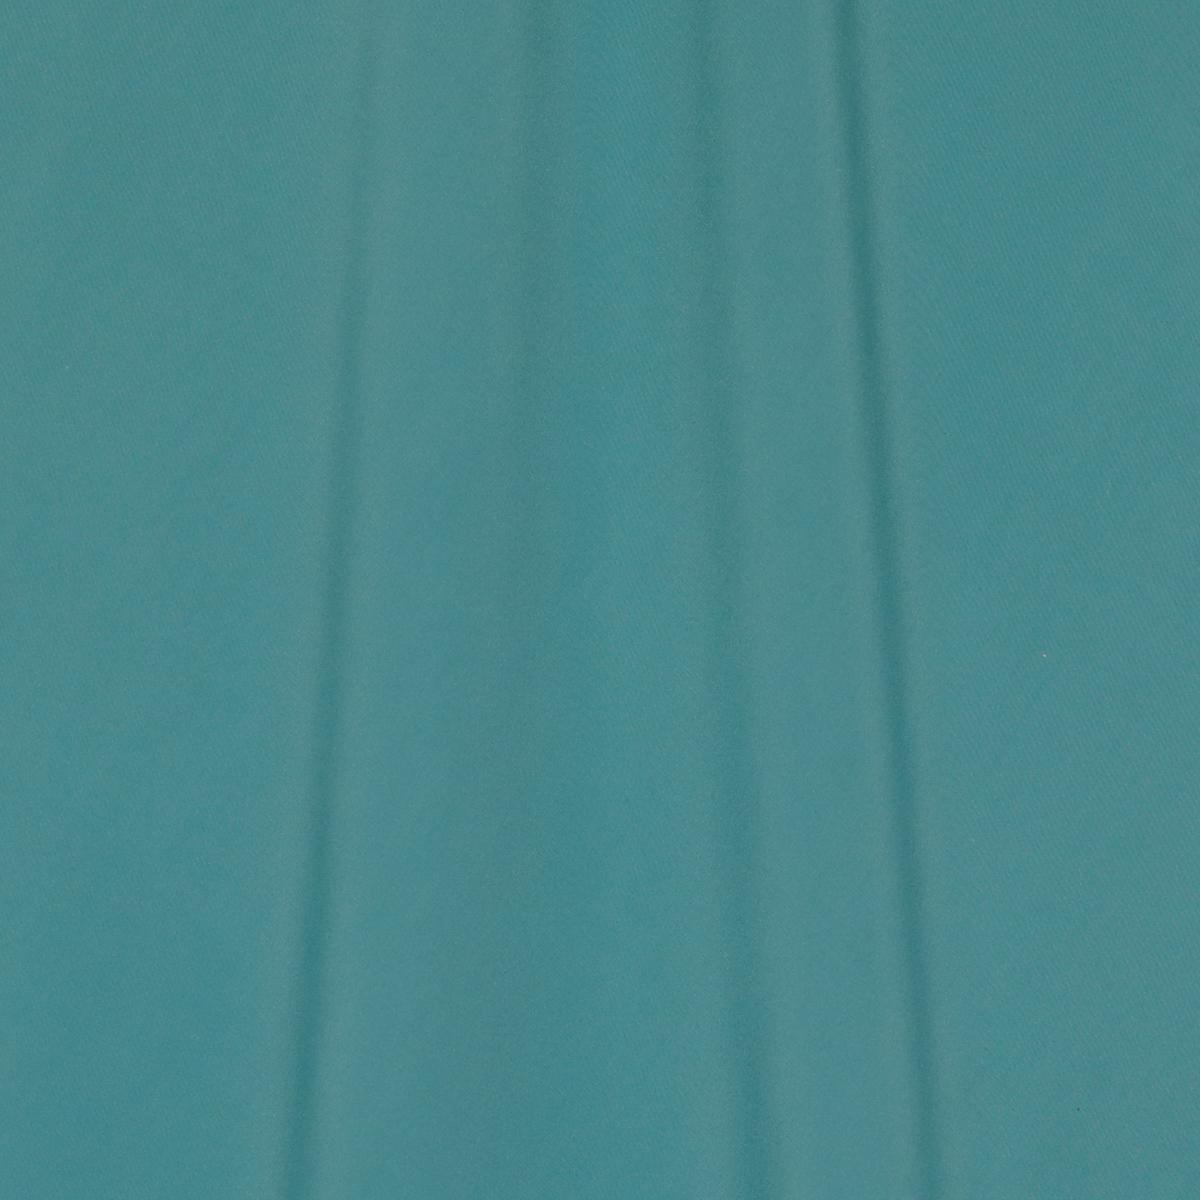 Шёлковый крепдешин тёмно-мятного цвета